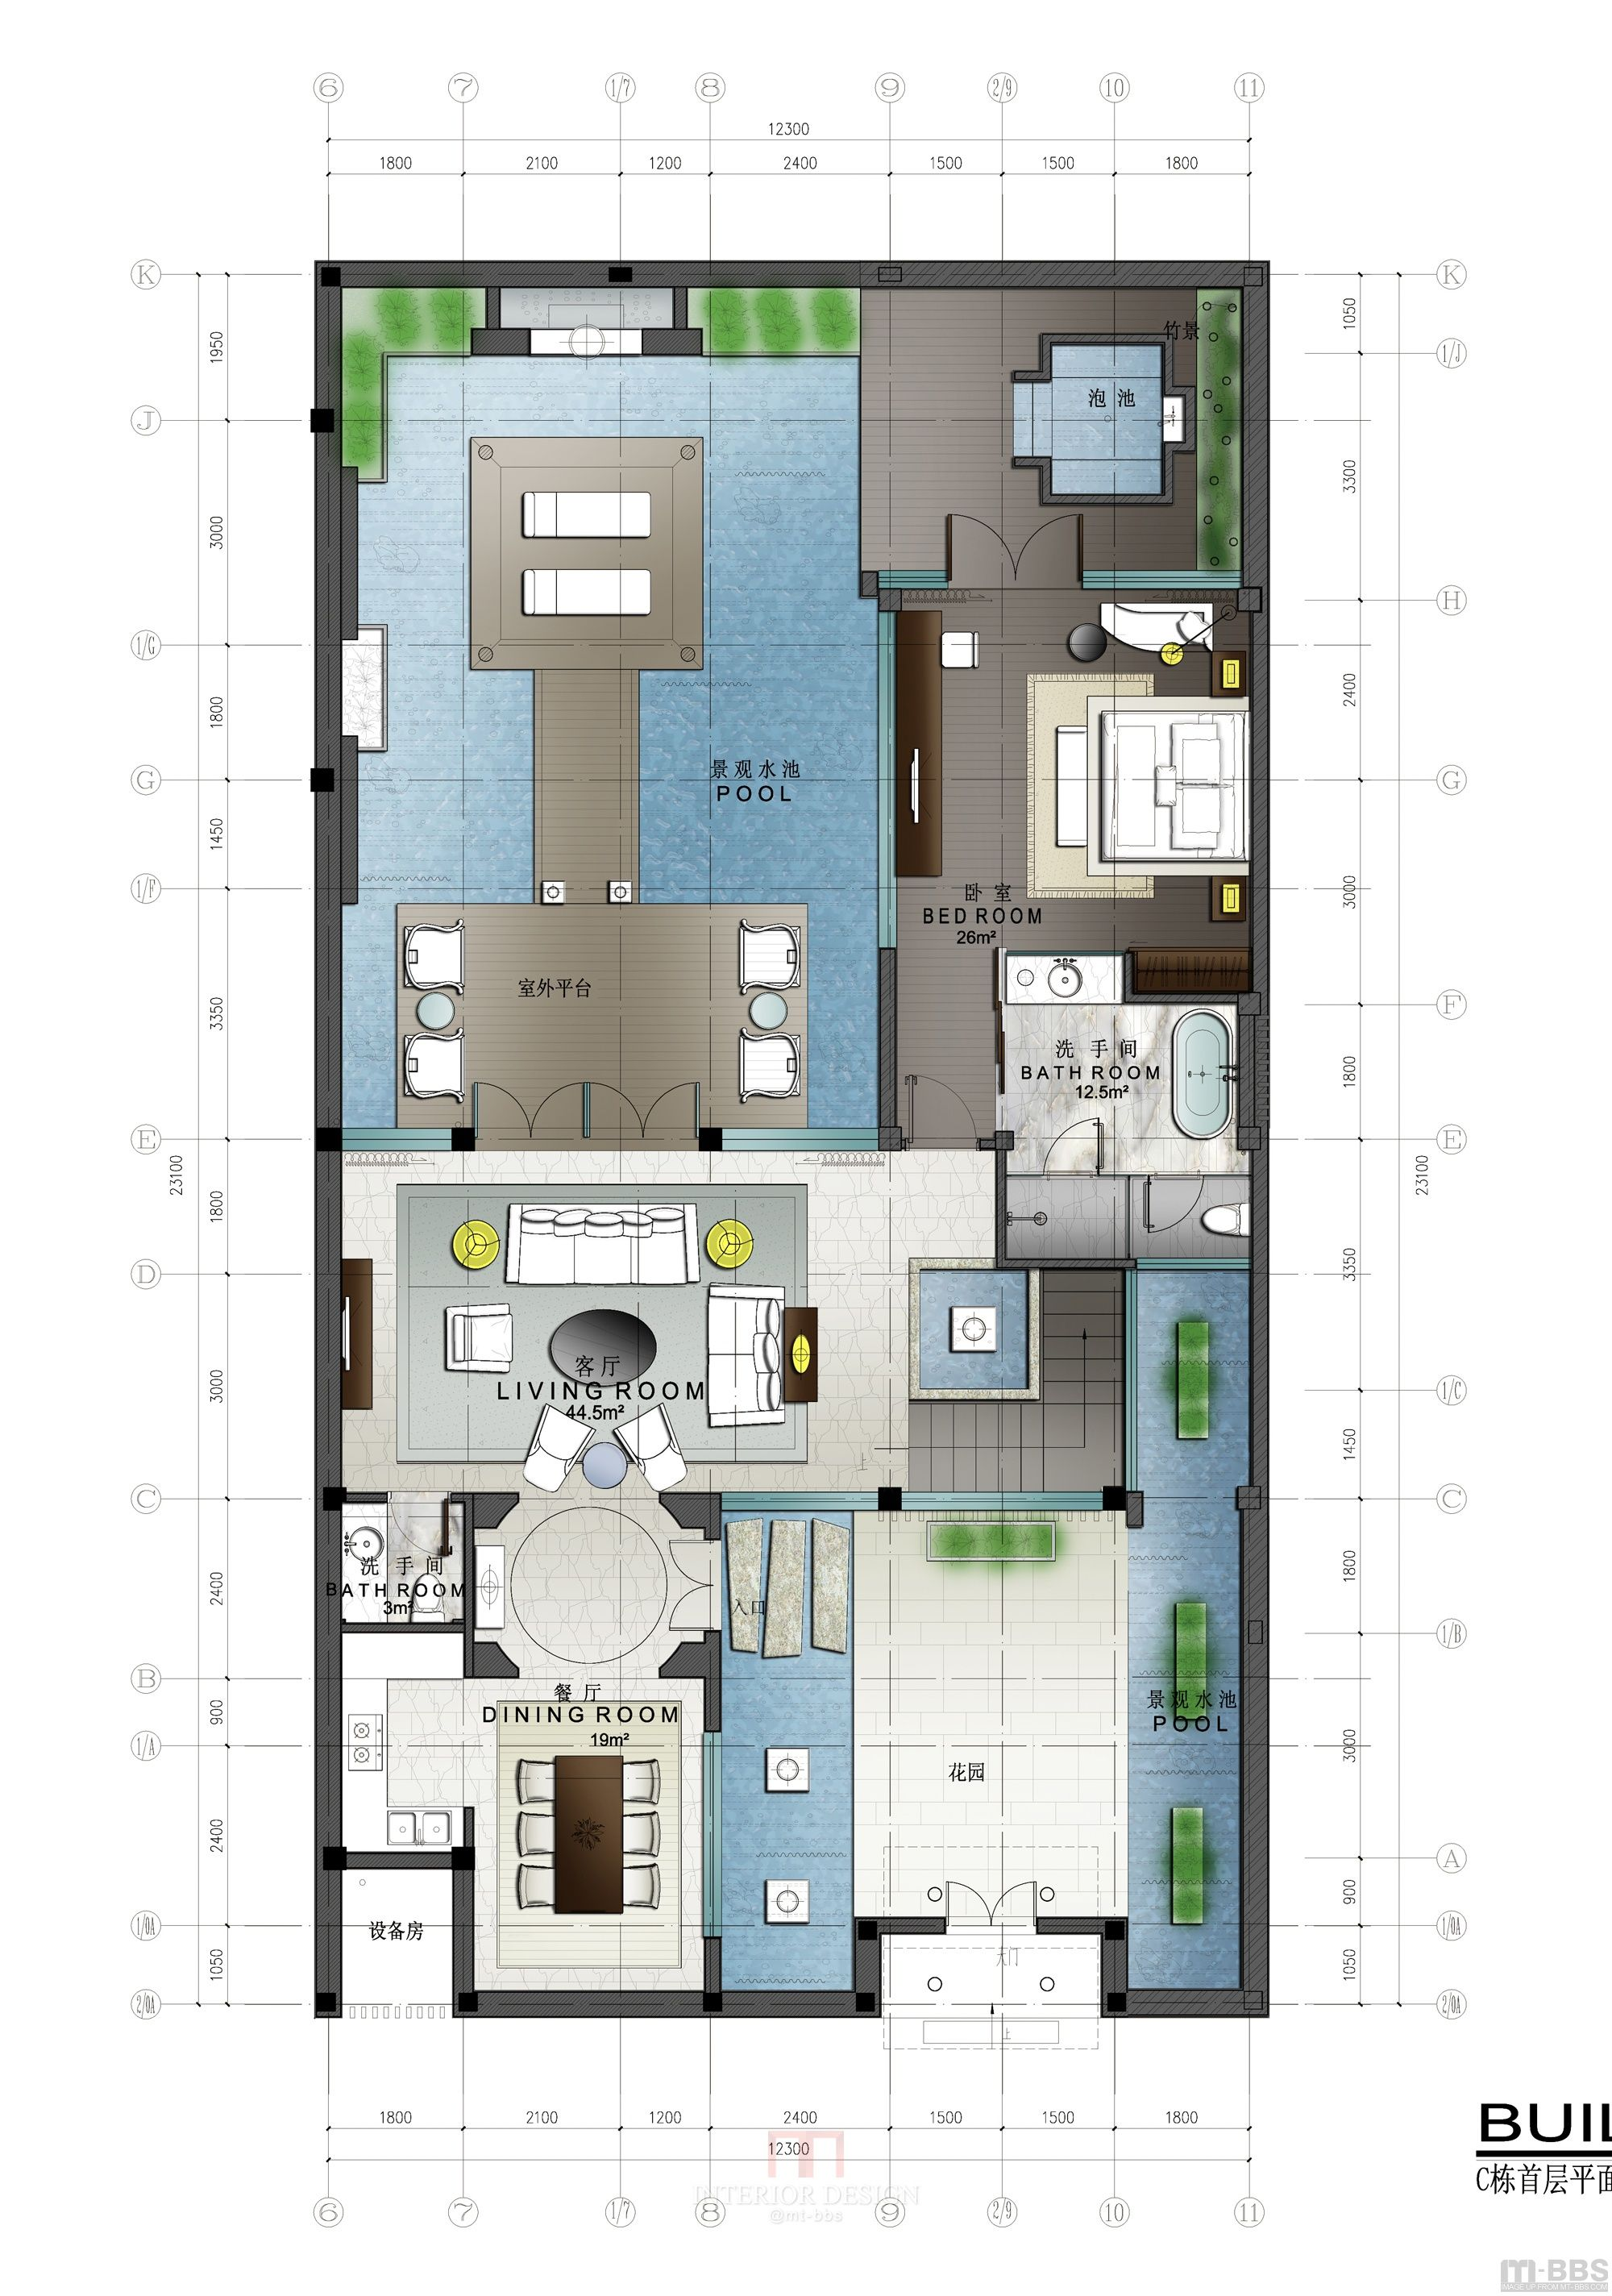 Pool Surrounding Patio Home Design Floor Plans Pool House Plans Floor Plan Design